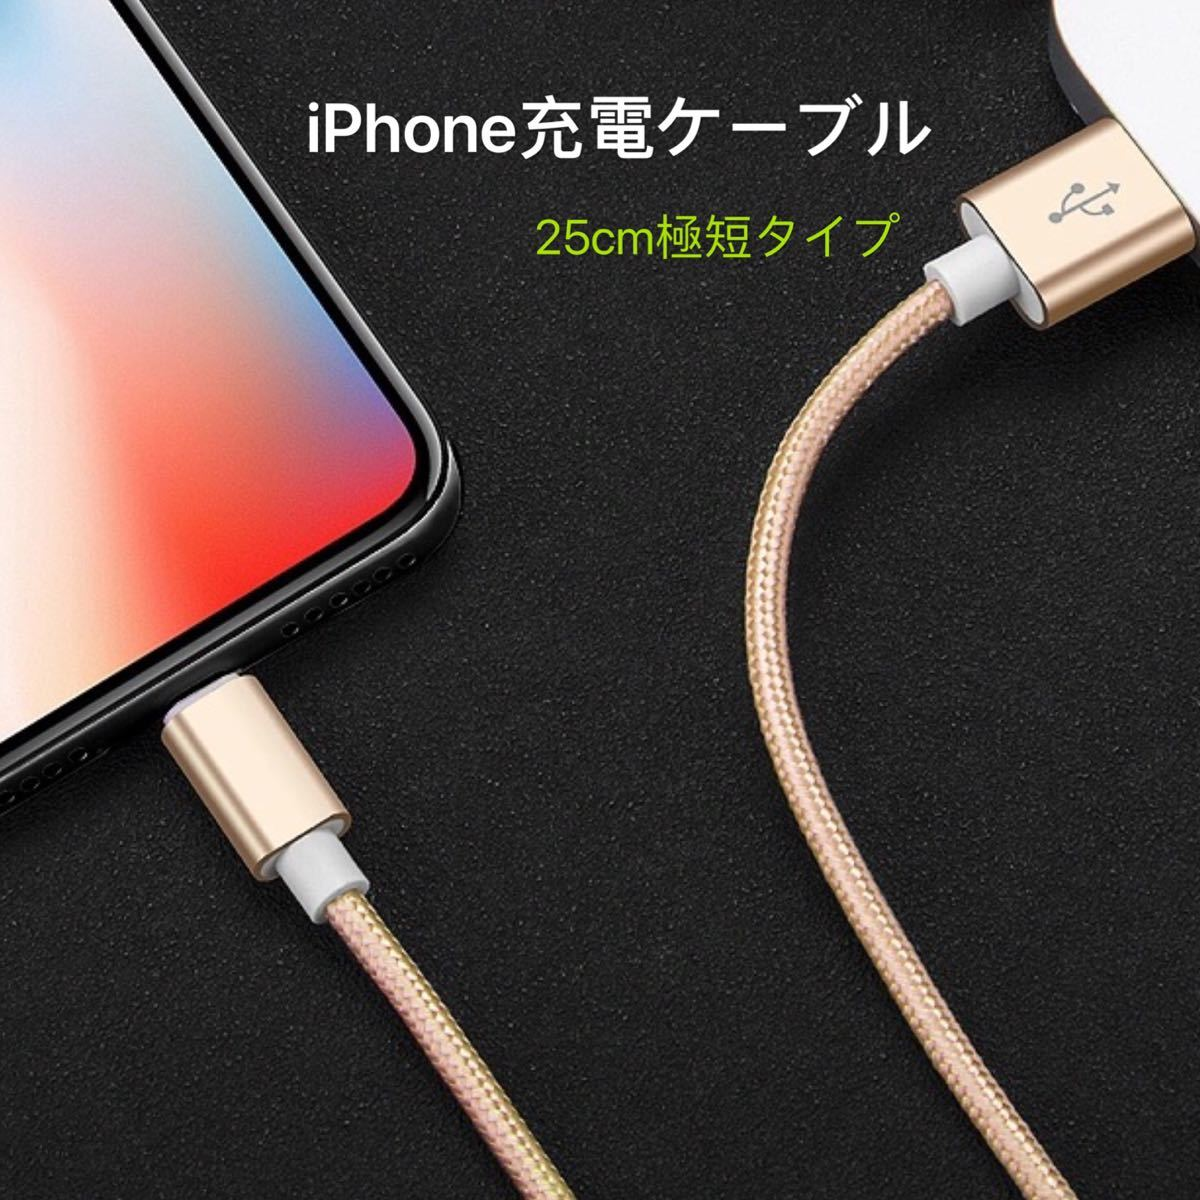 iPhone 充電ケーブル 25cm 急速充電 断線防止 強化素材 iPhone12 11 iPhoneX iPhone各種